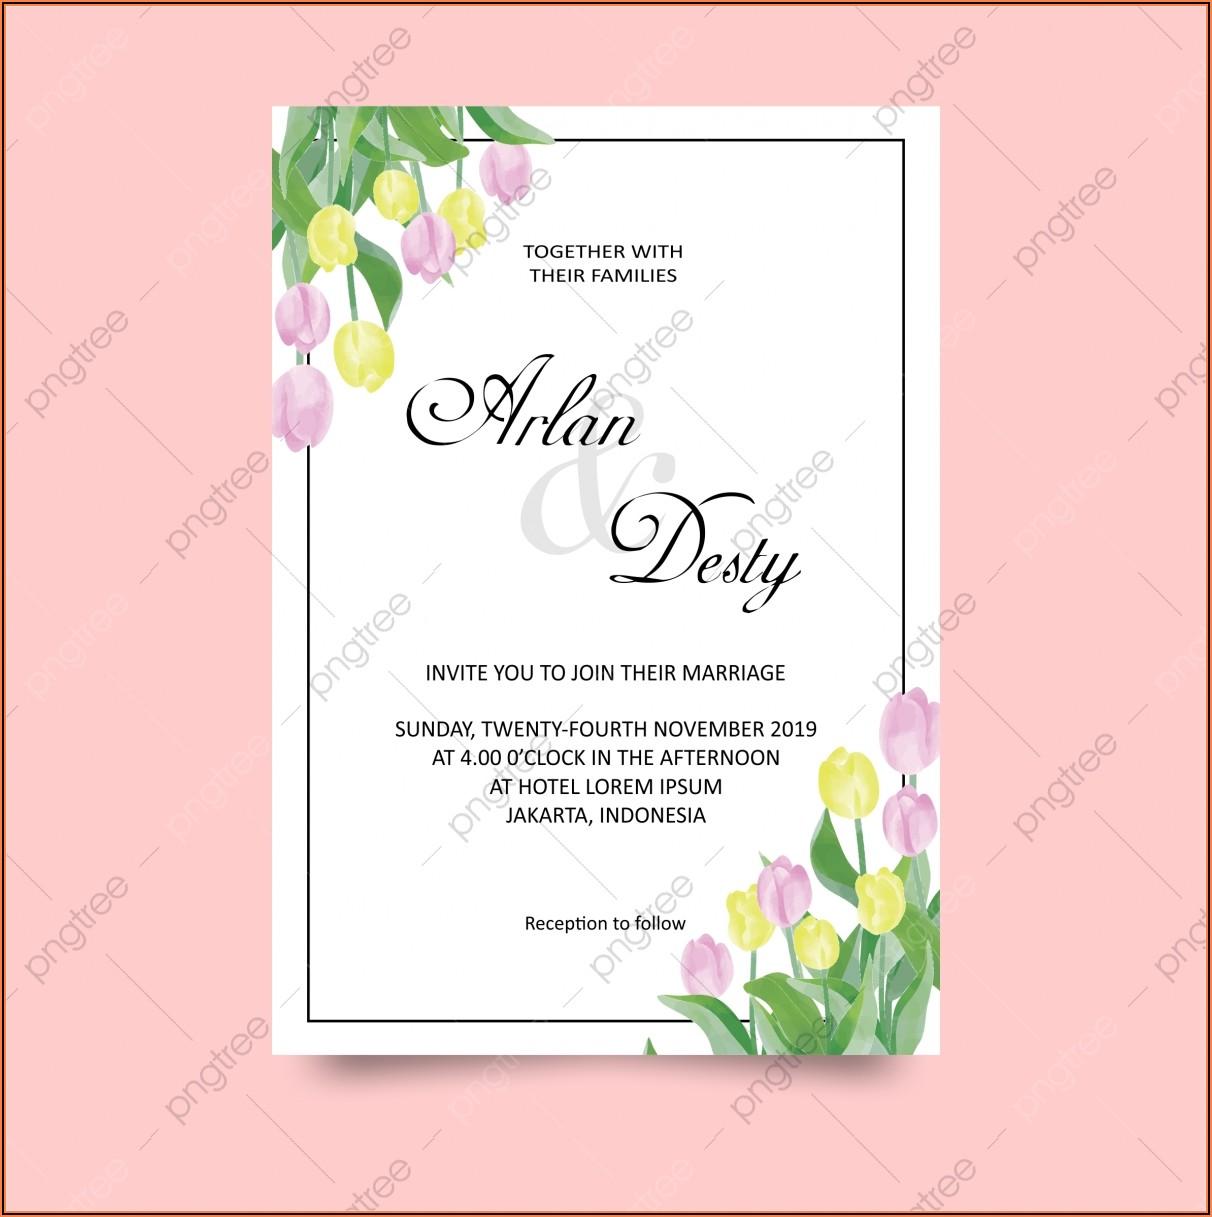 Wedding Invitation Templates Pngtree